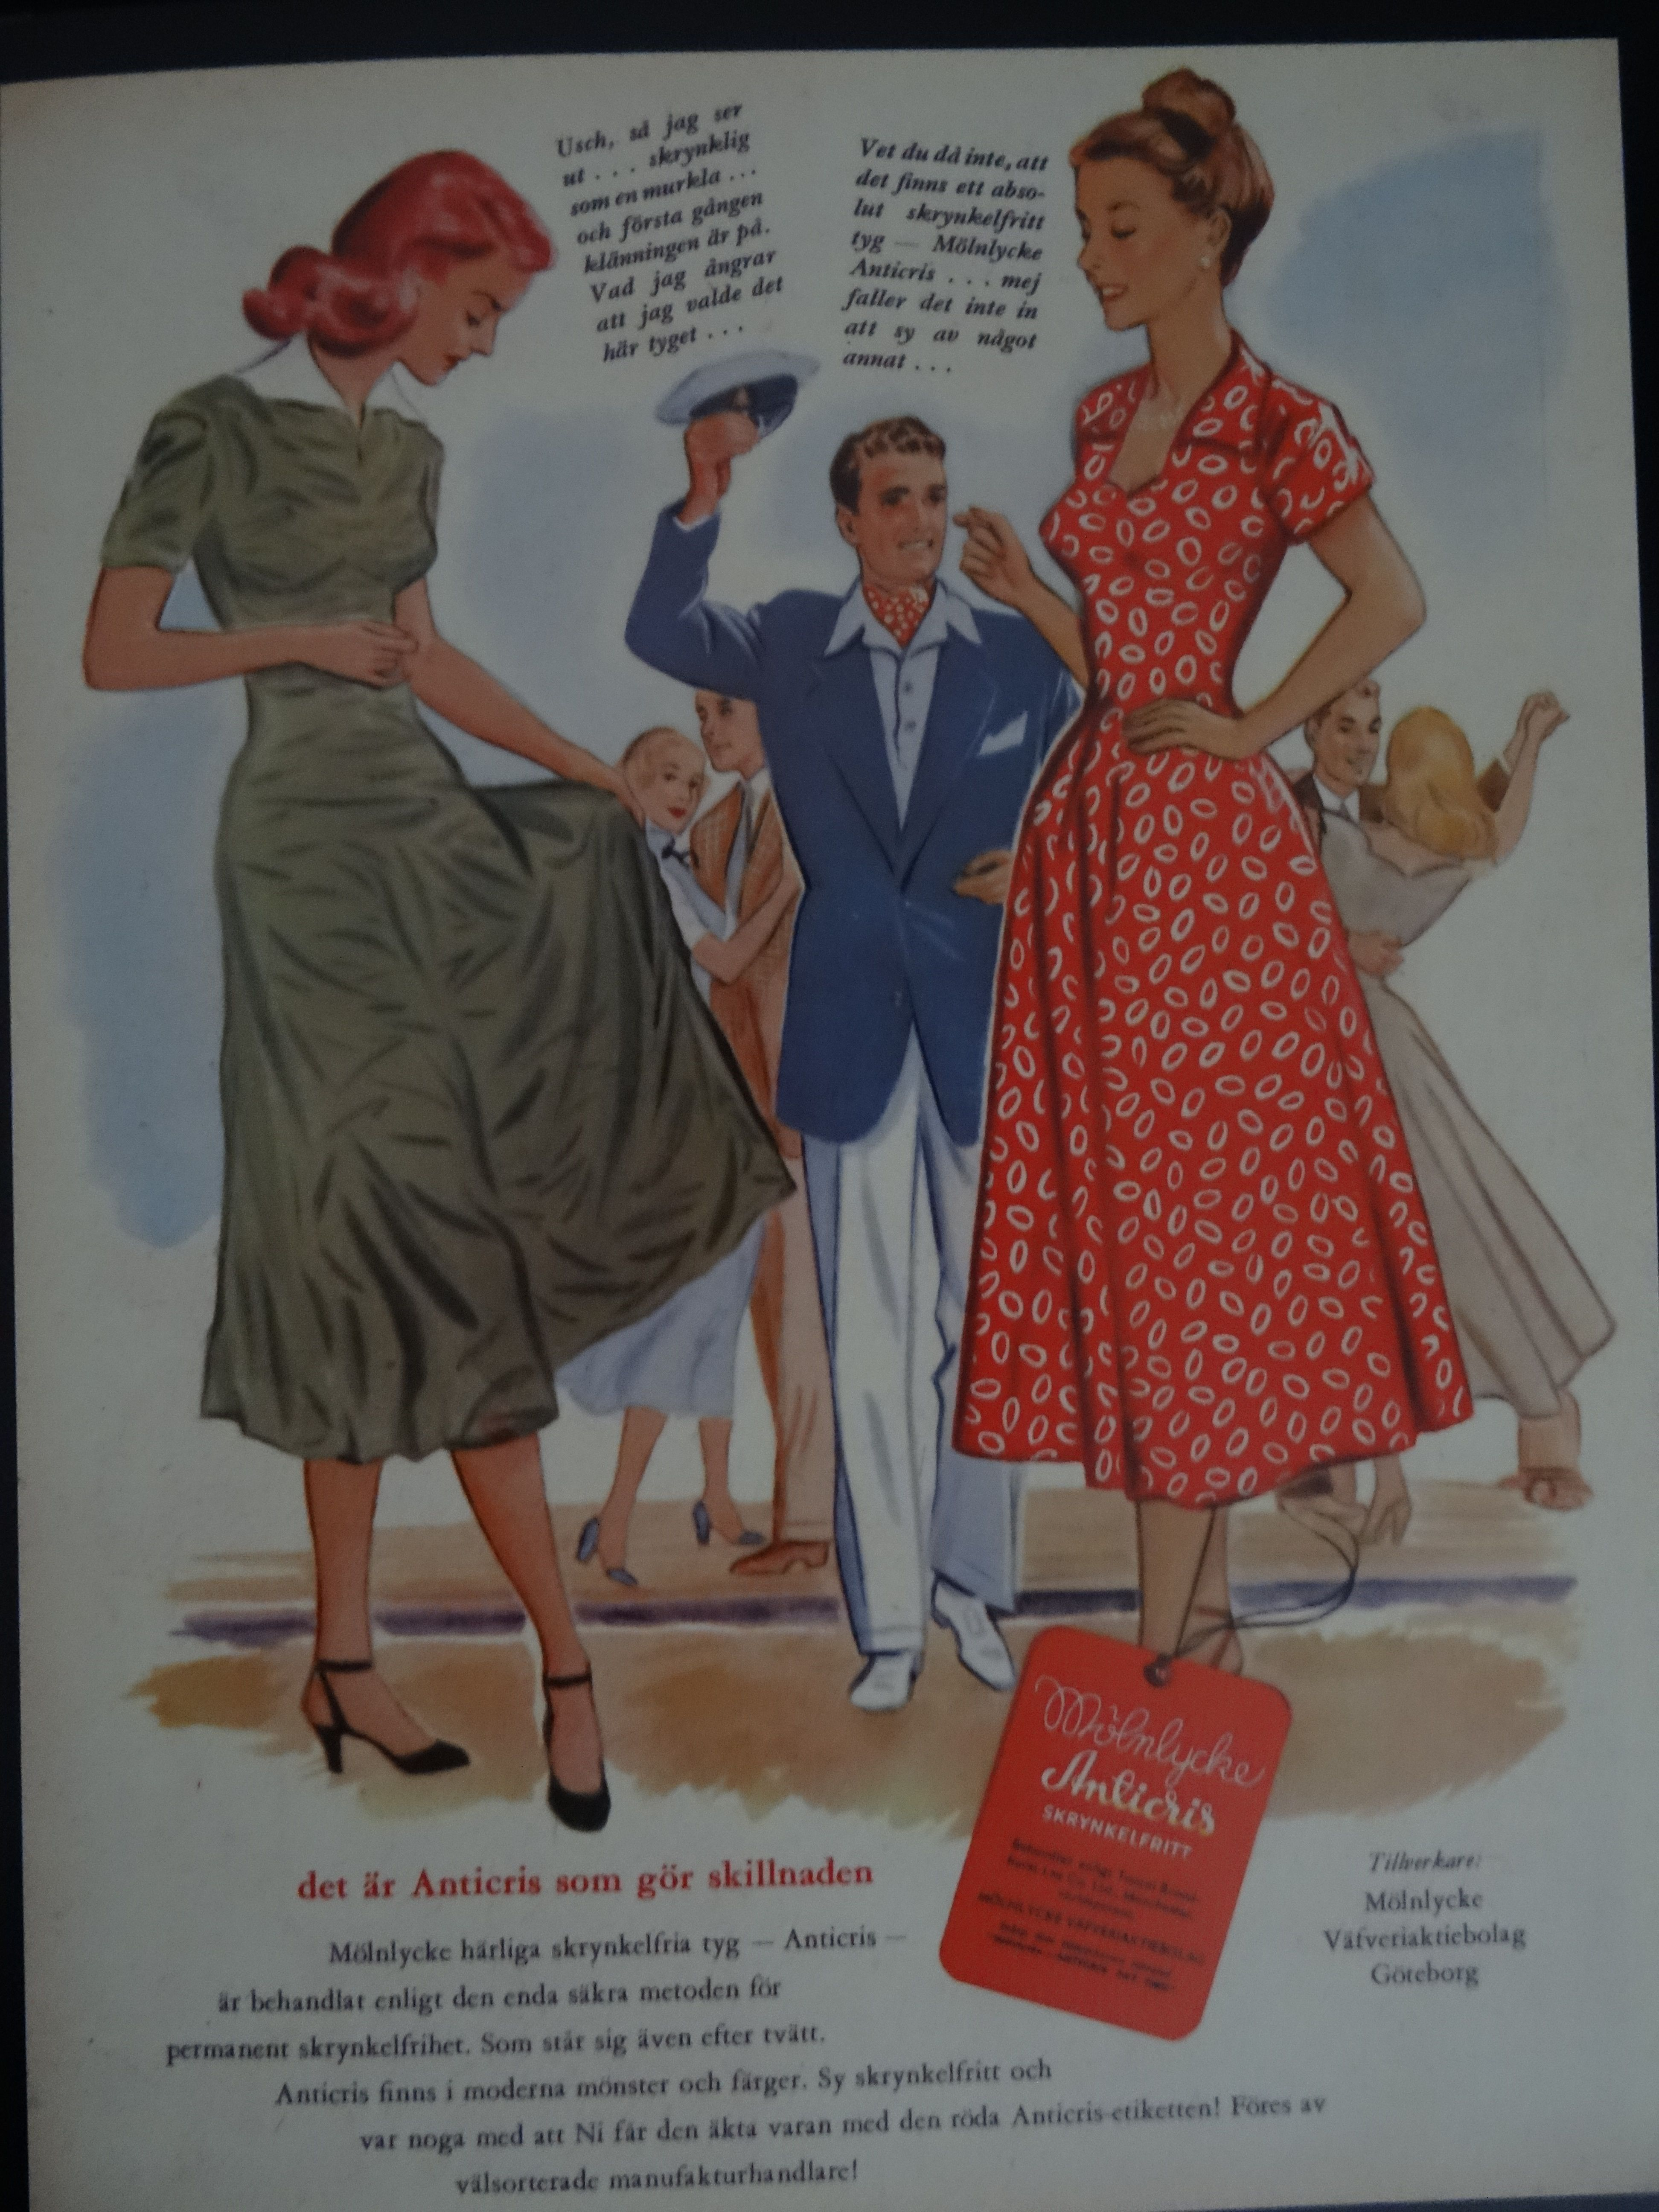 Molnlycke Anticris I Molnlycke Vafveriaktiebolag Goteborg I 1949 Summer Dresses Fashion Dresses